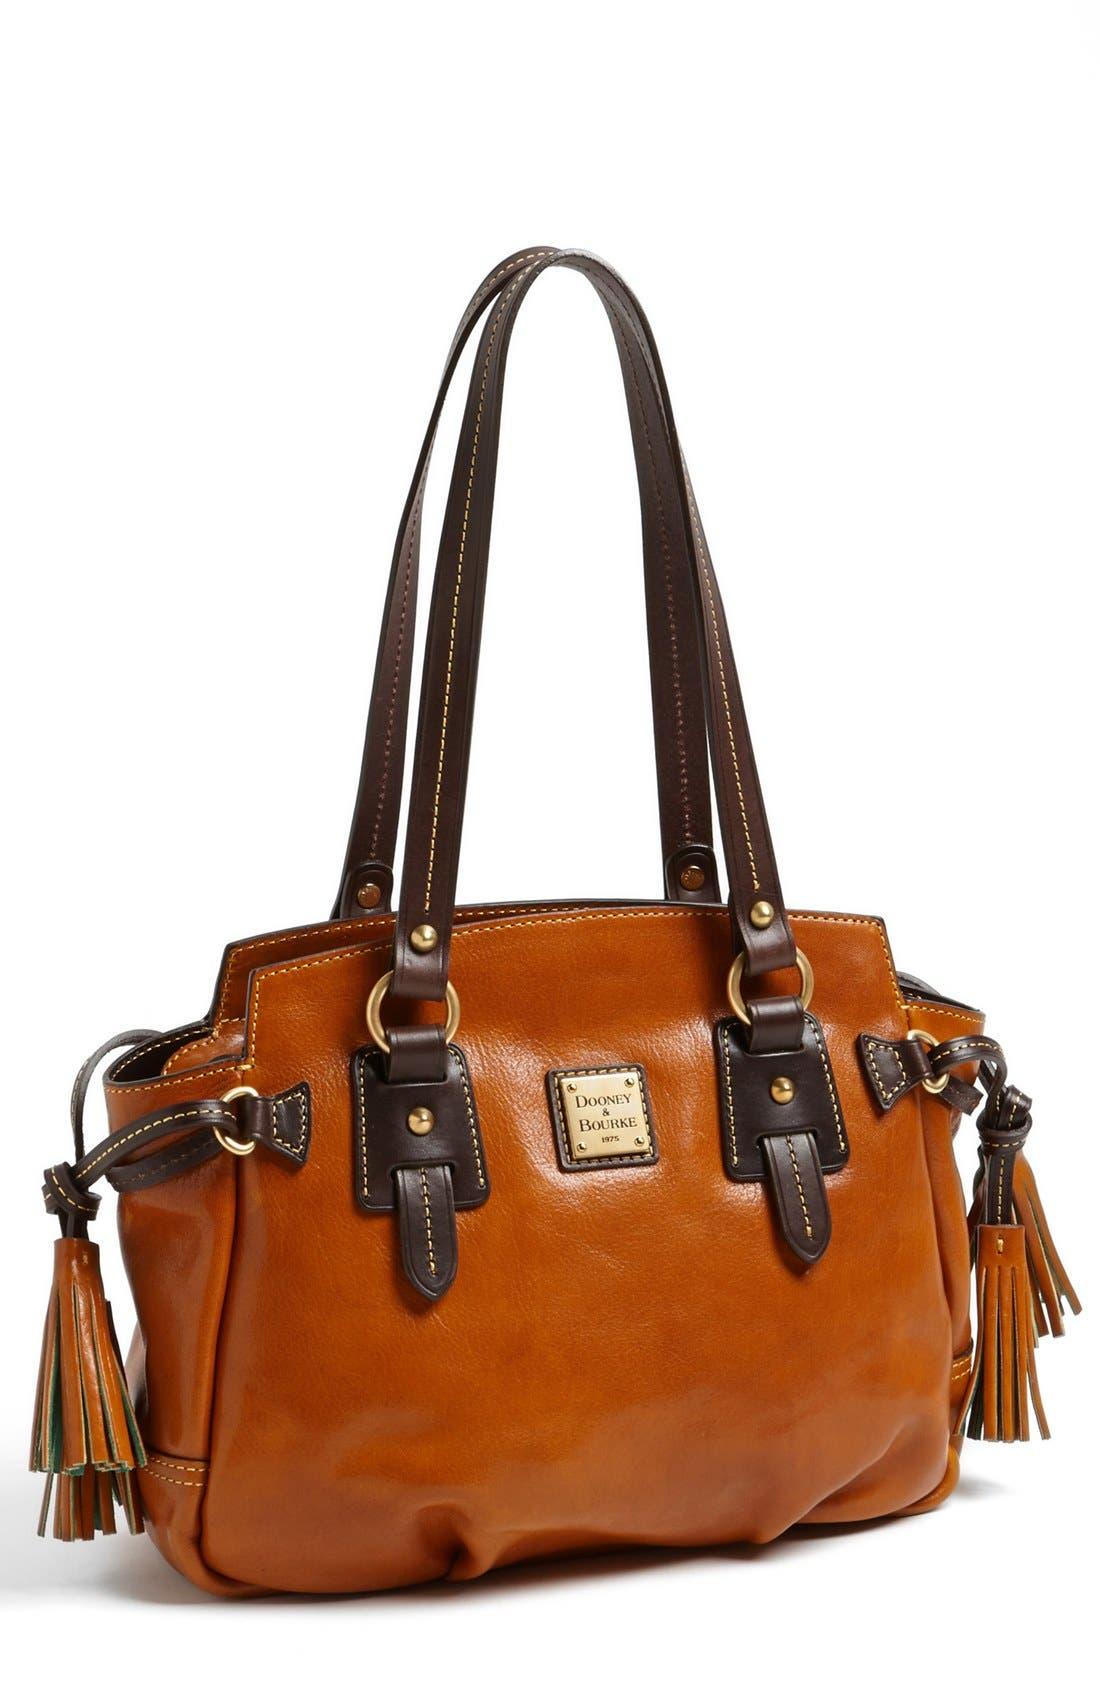 Alternate Image 1 Selected - Dooney & Bourke 'Winged - Small' Leather Handbag